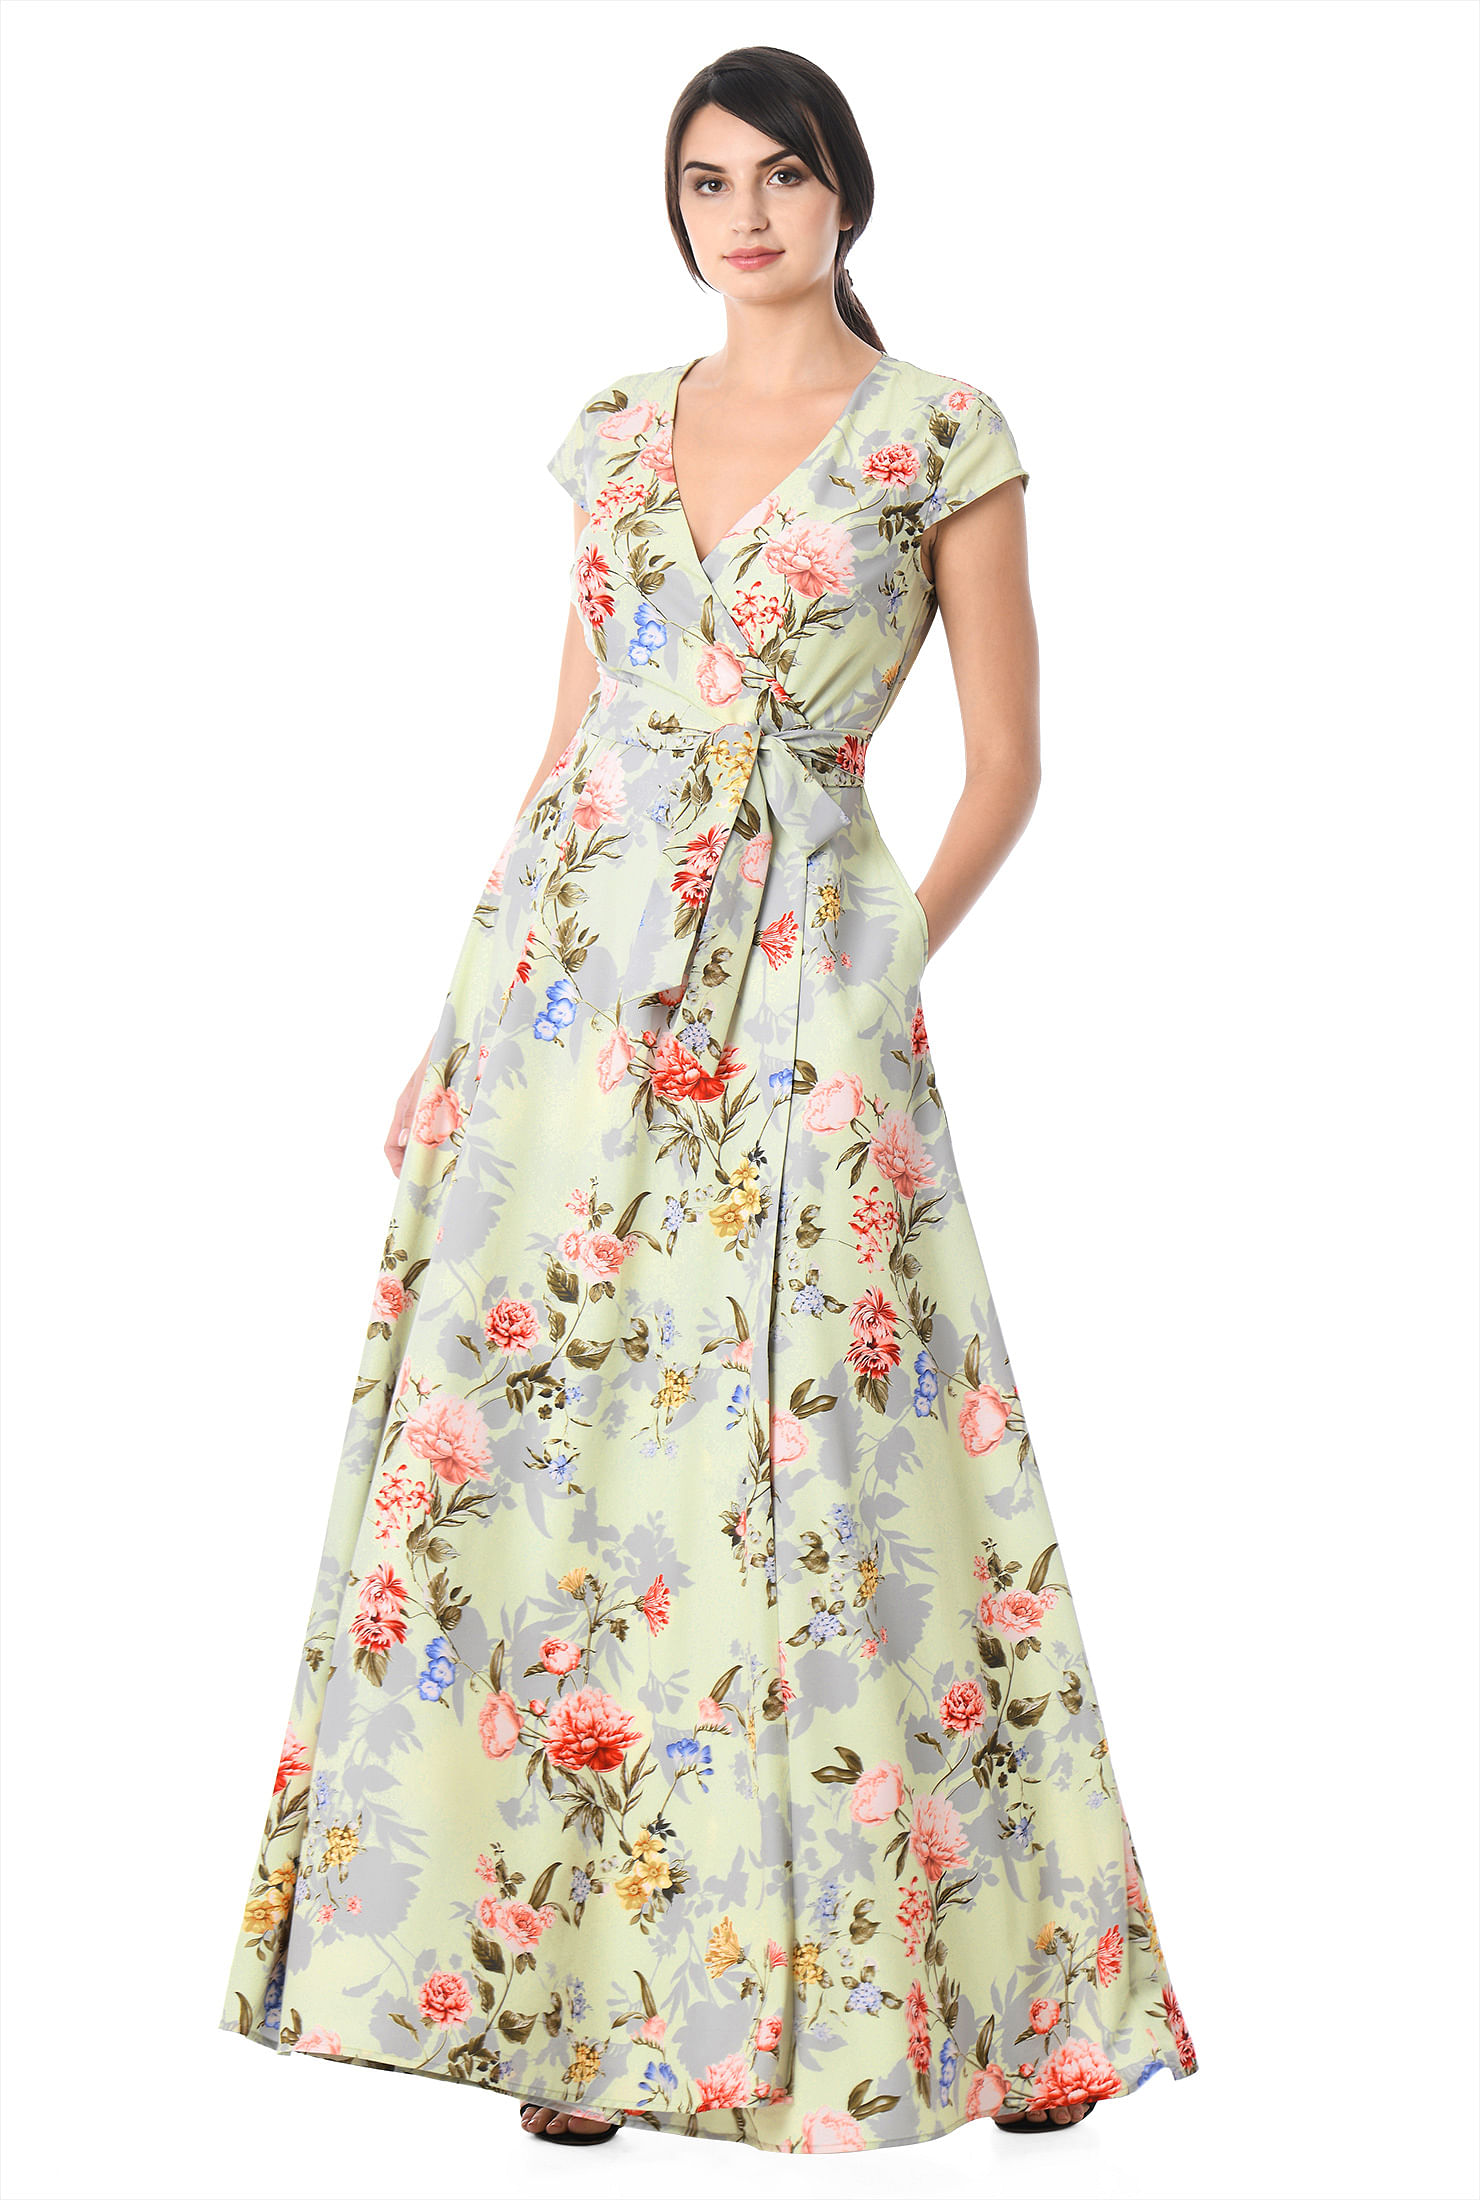 7e95d3f01f8b floral print dresses, full length with 3